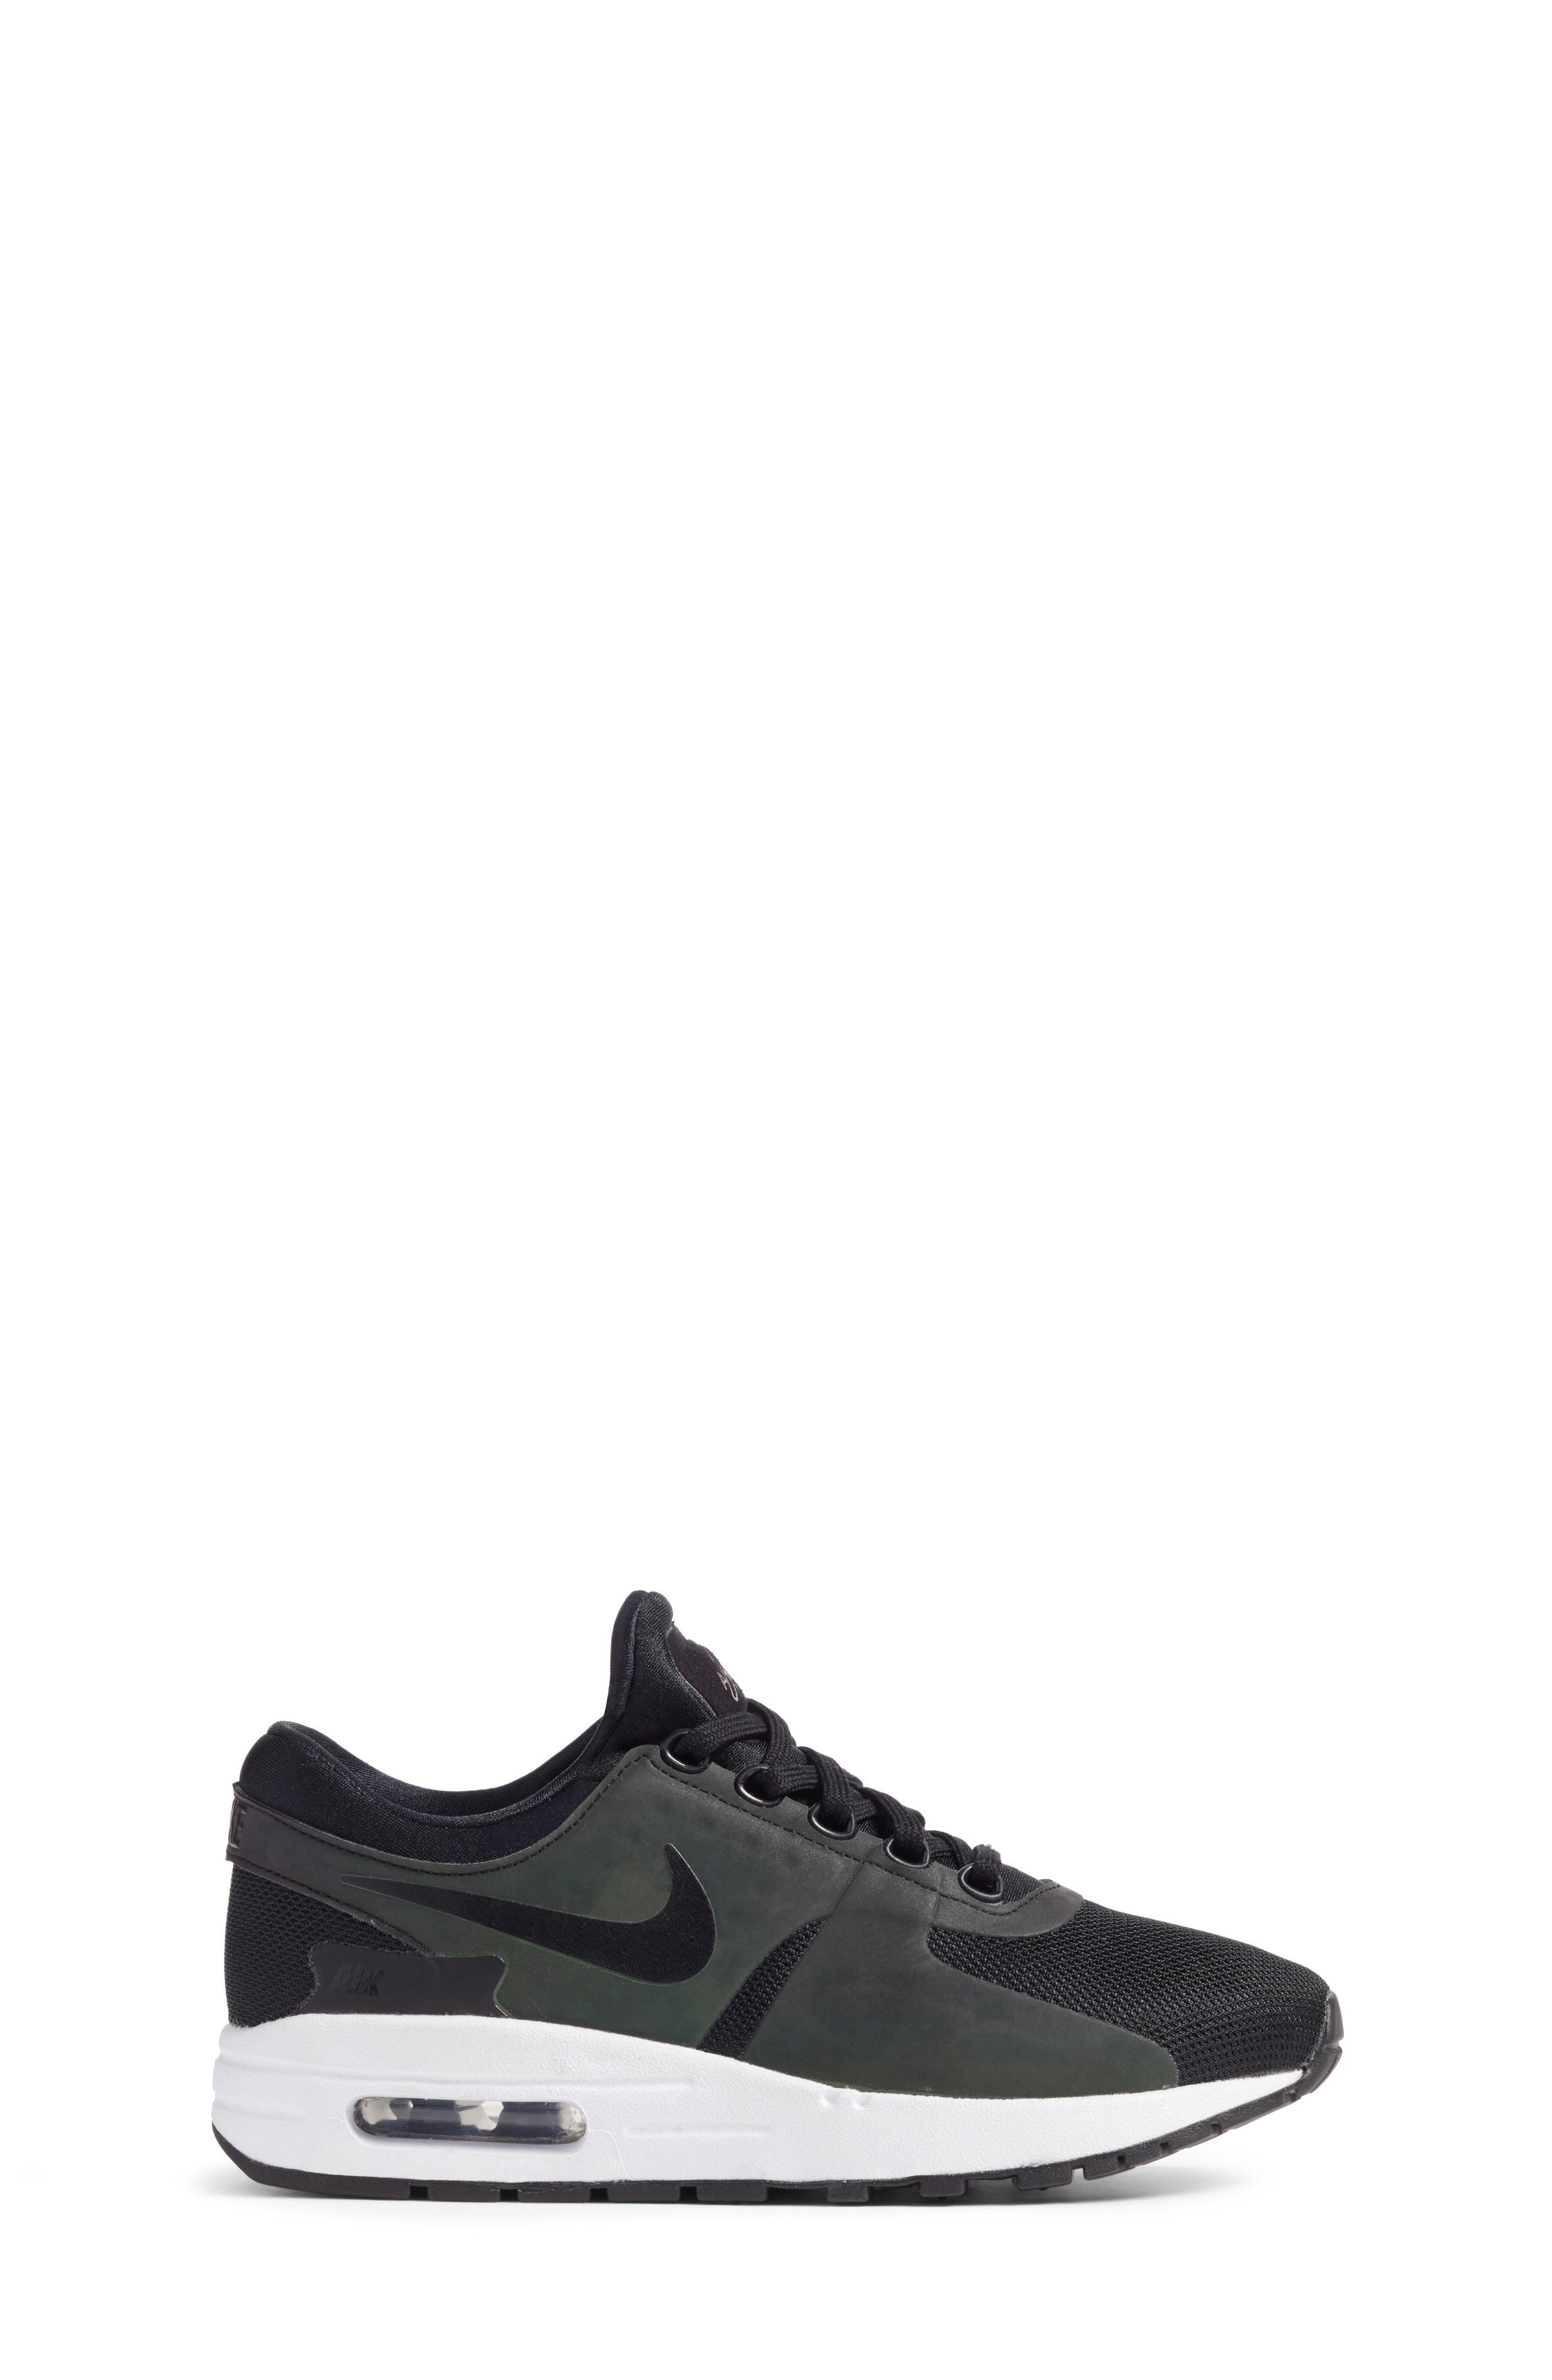 Air Max Zero Sneaker,                             Alternate thumbnail 3, color,